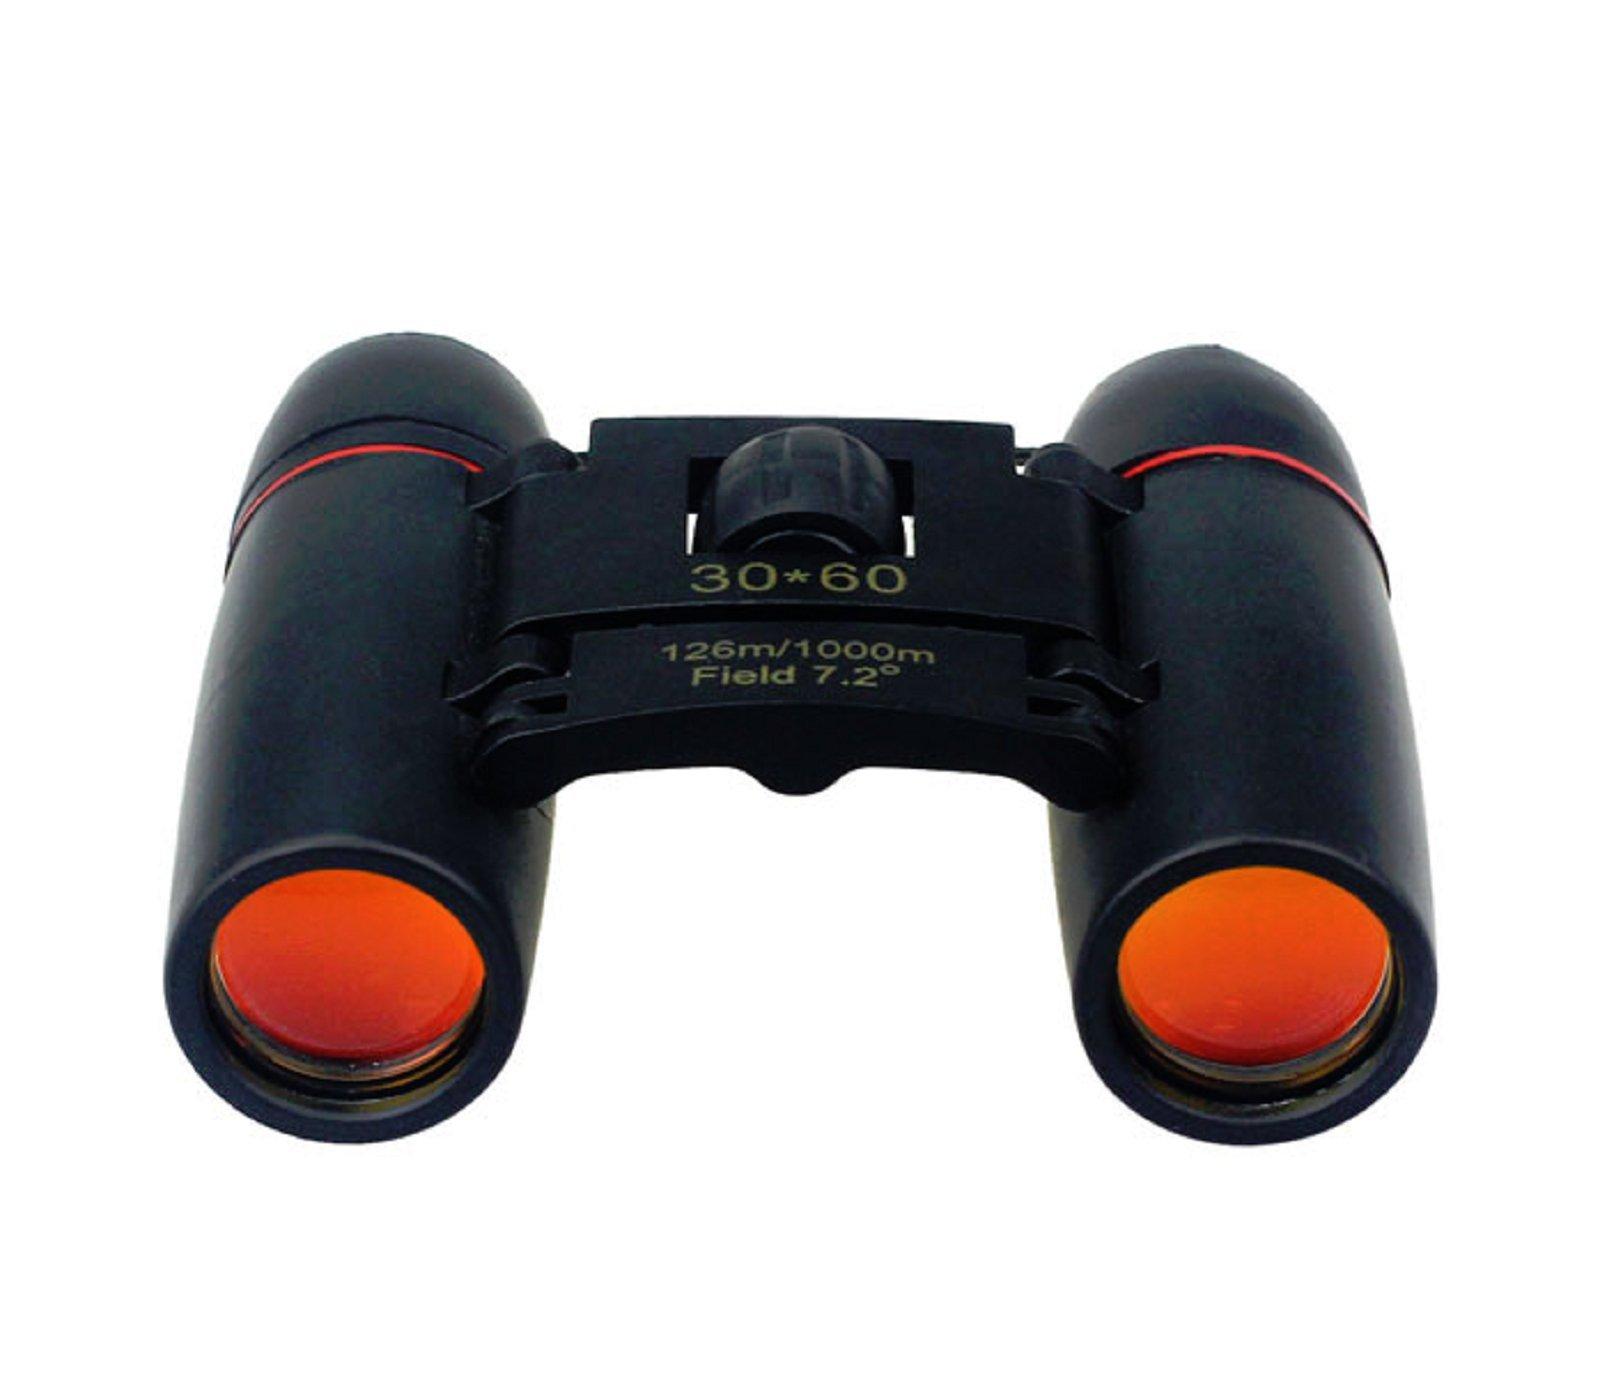 30x60 Zoom Mini Outdoor Binoculars Folding Telescopes Day Night Vision by Polarbear's Shop